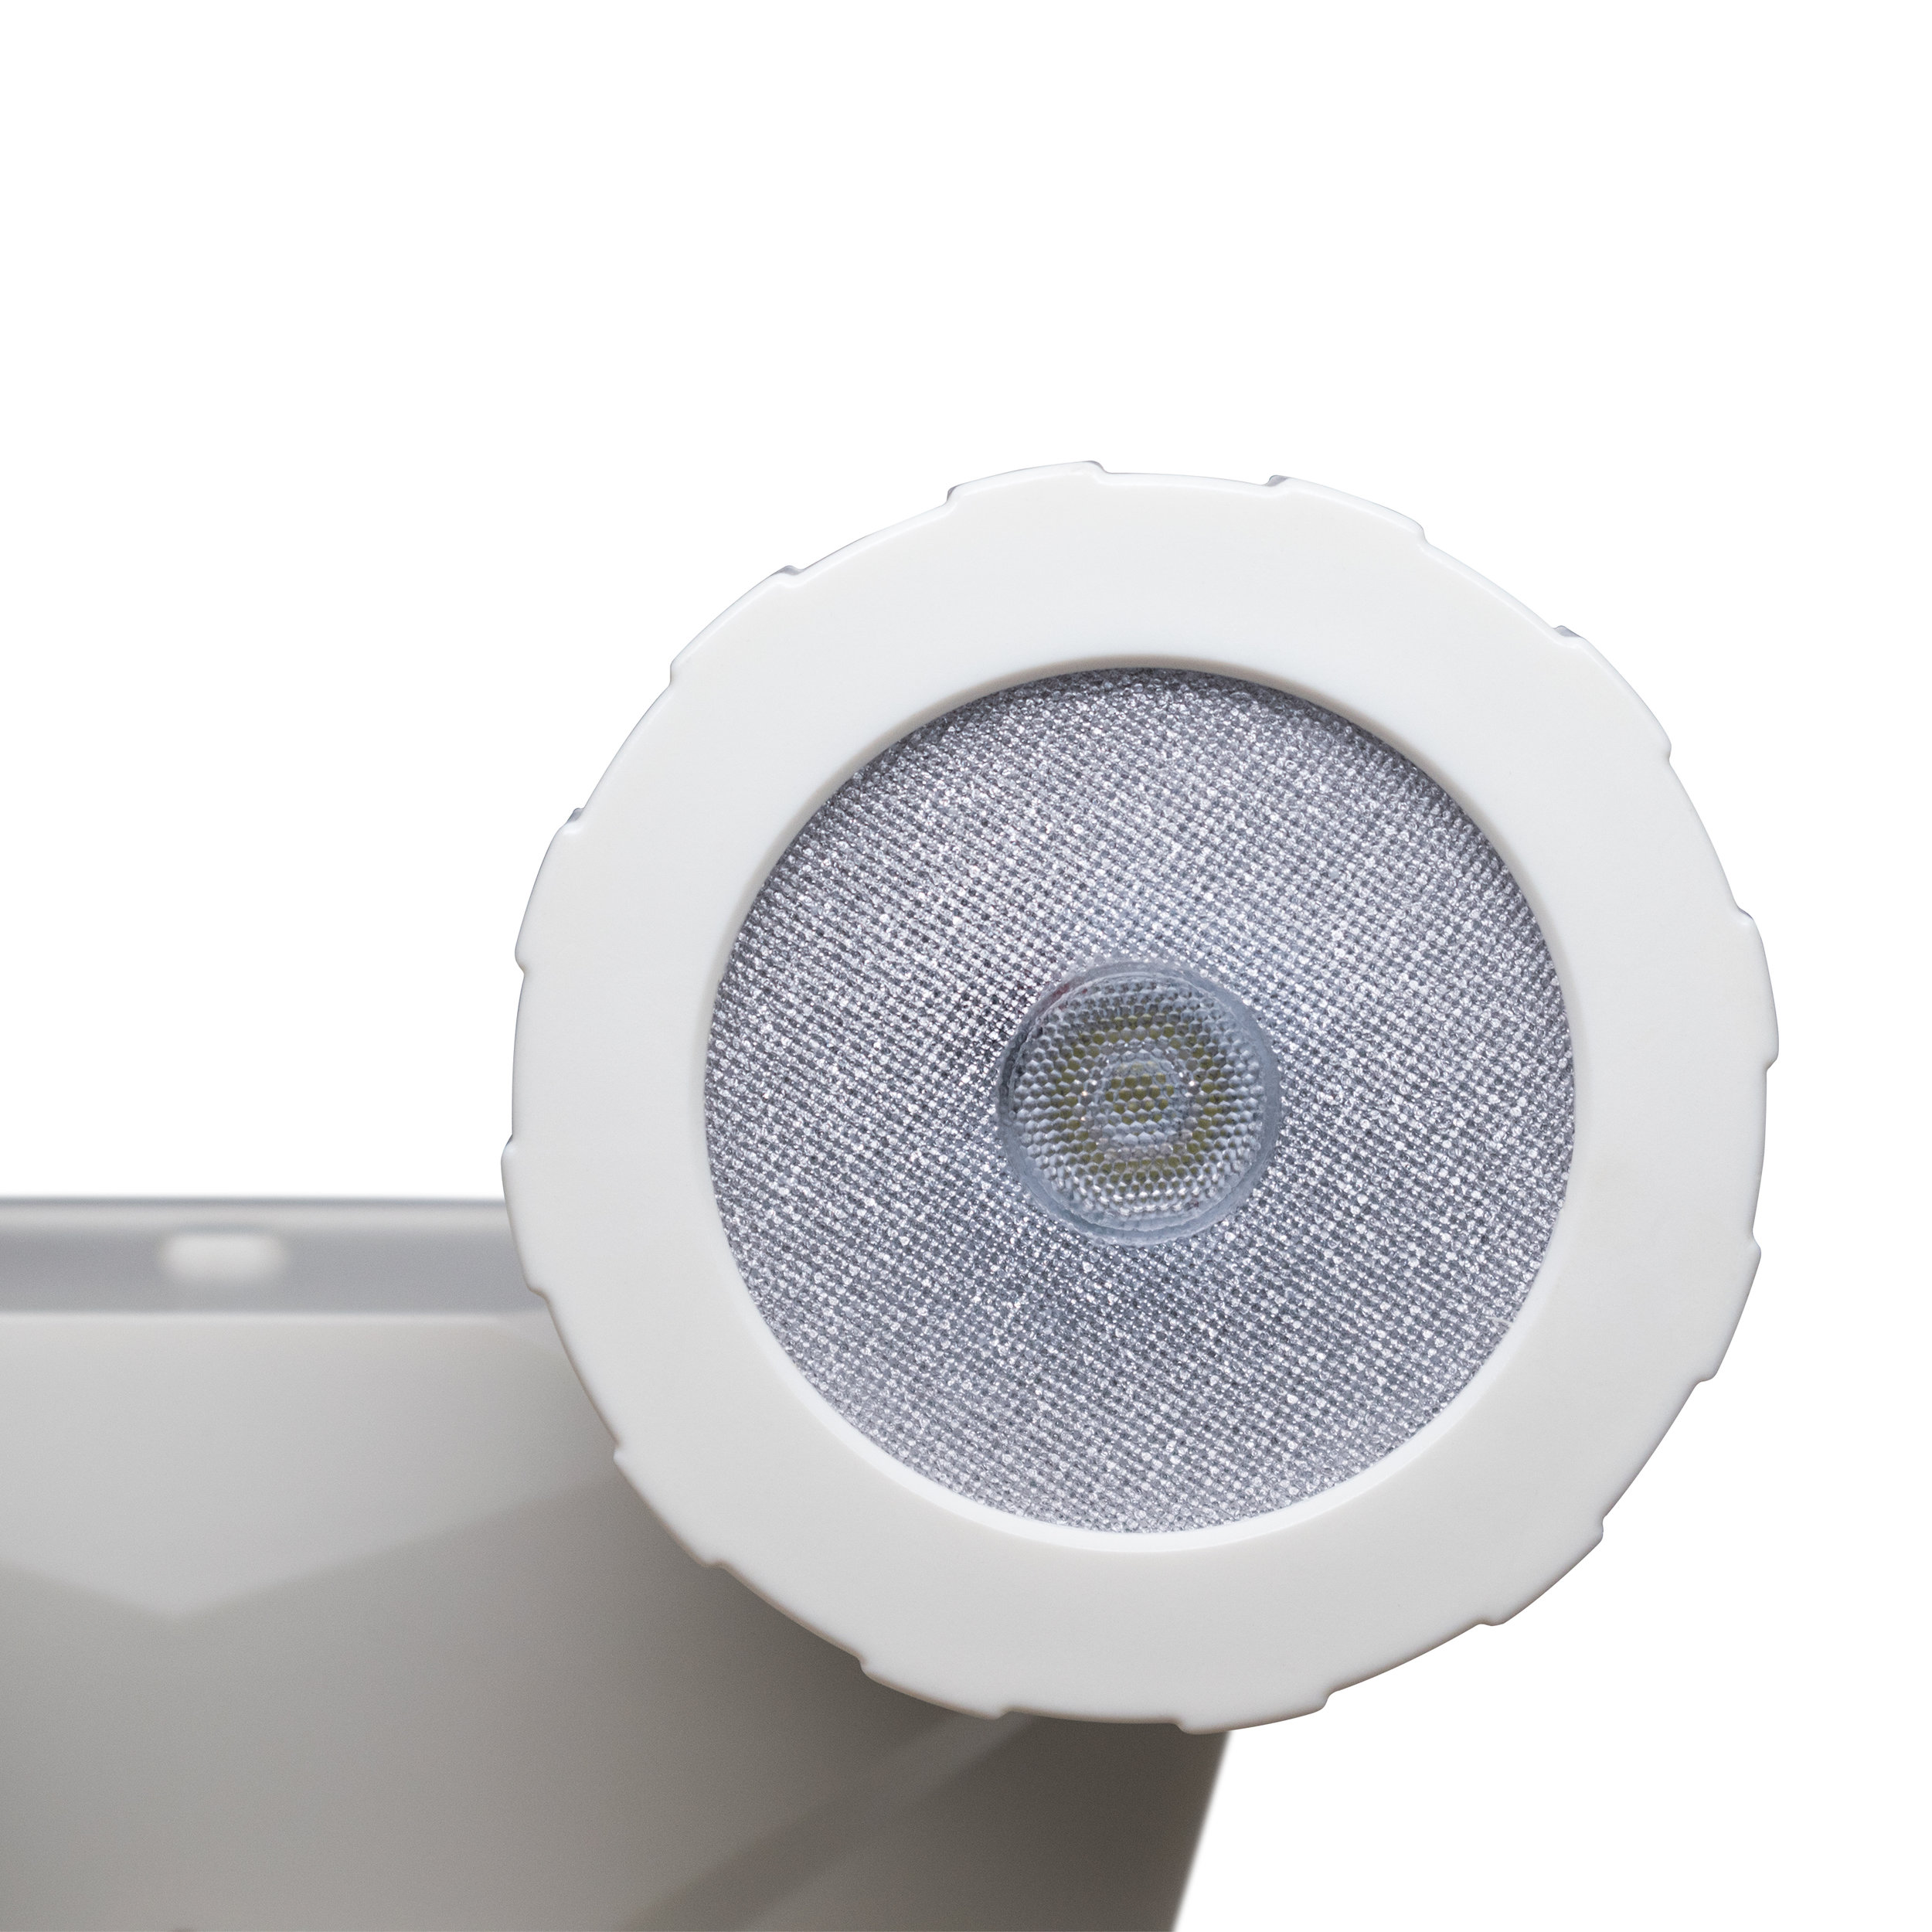 Novolink NL-DSW2 Solar Security Light, Lamp Head detail